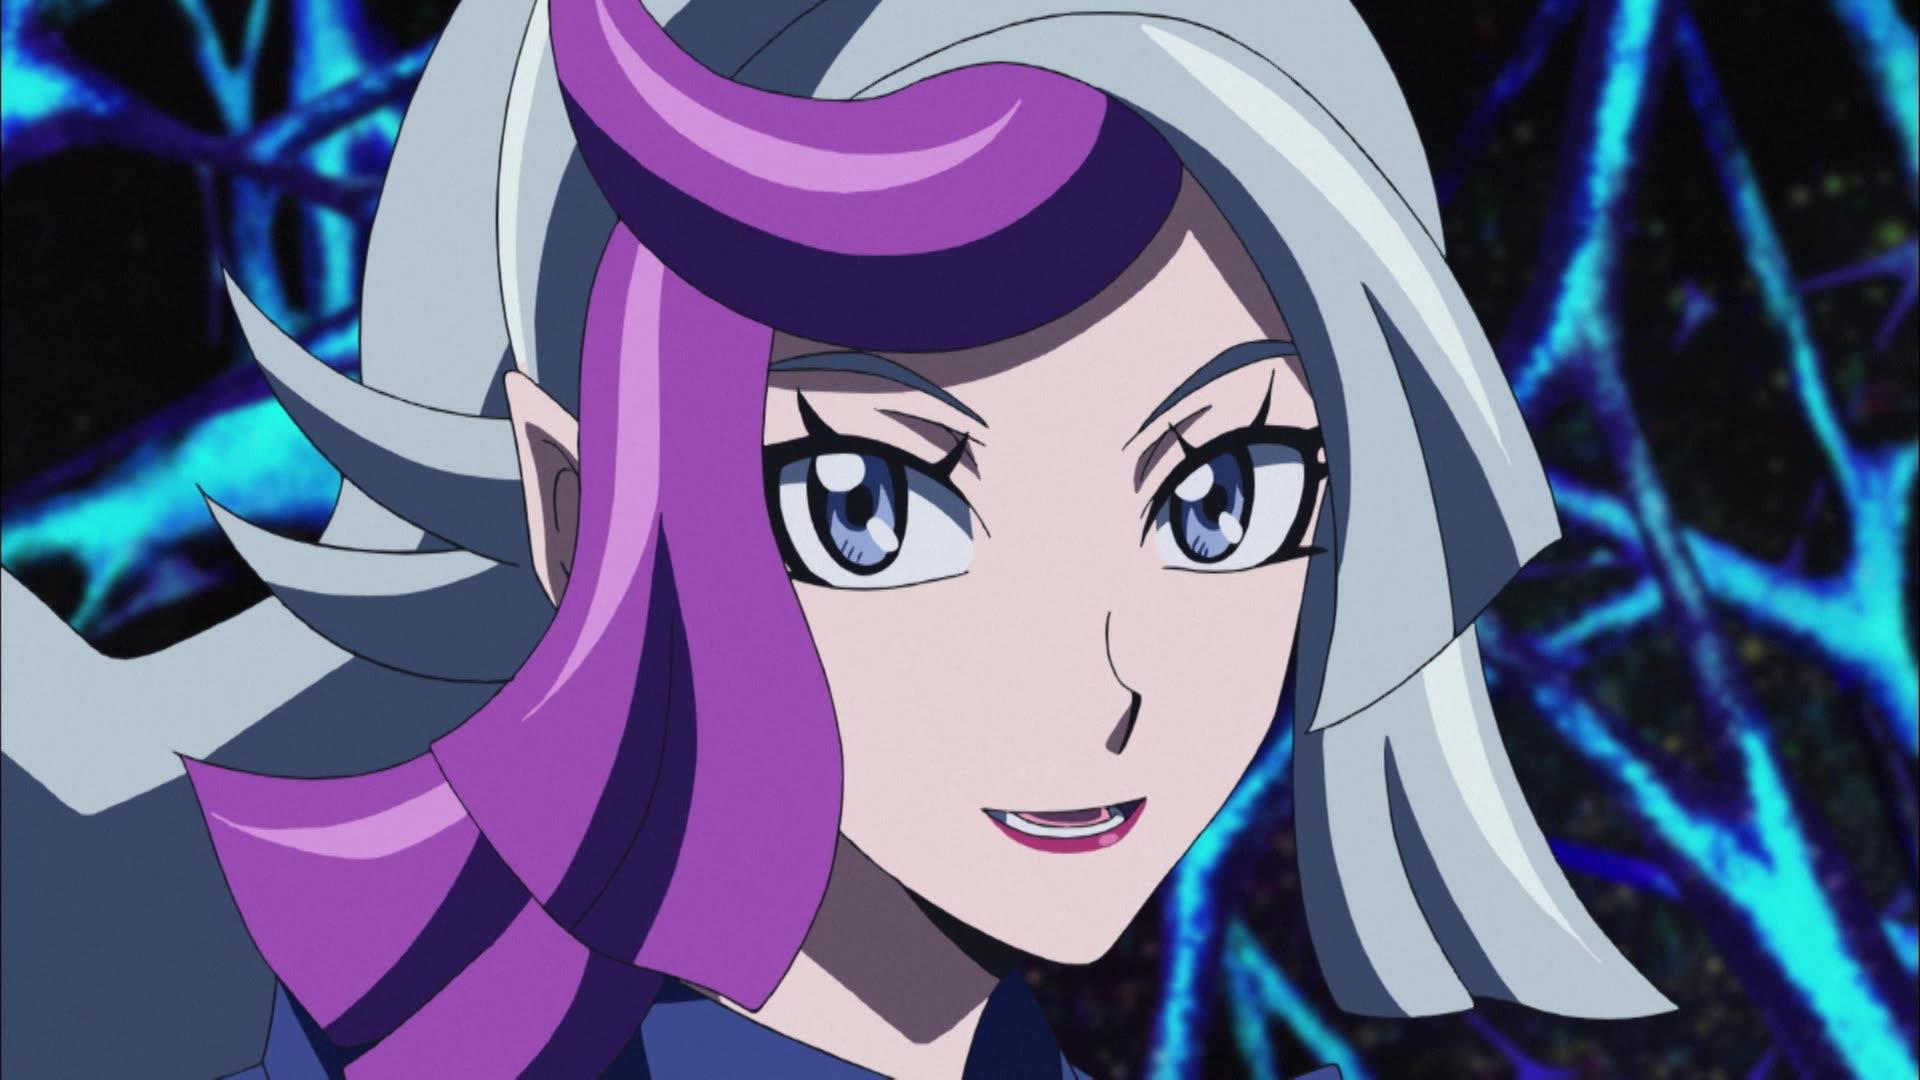 Yu-Gi-Oh! VRAINS Episode 107, Slay the Demon, - Watch on Crunchyroll